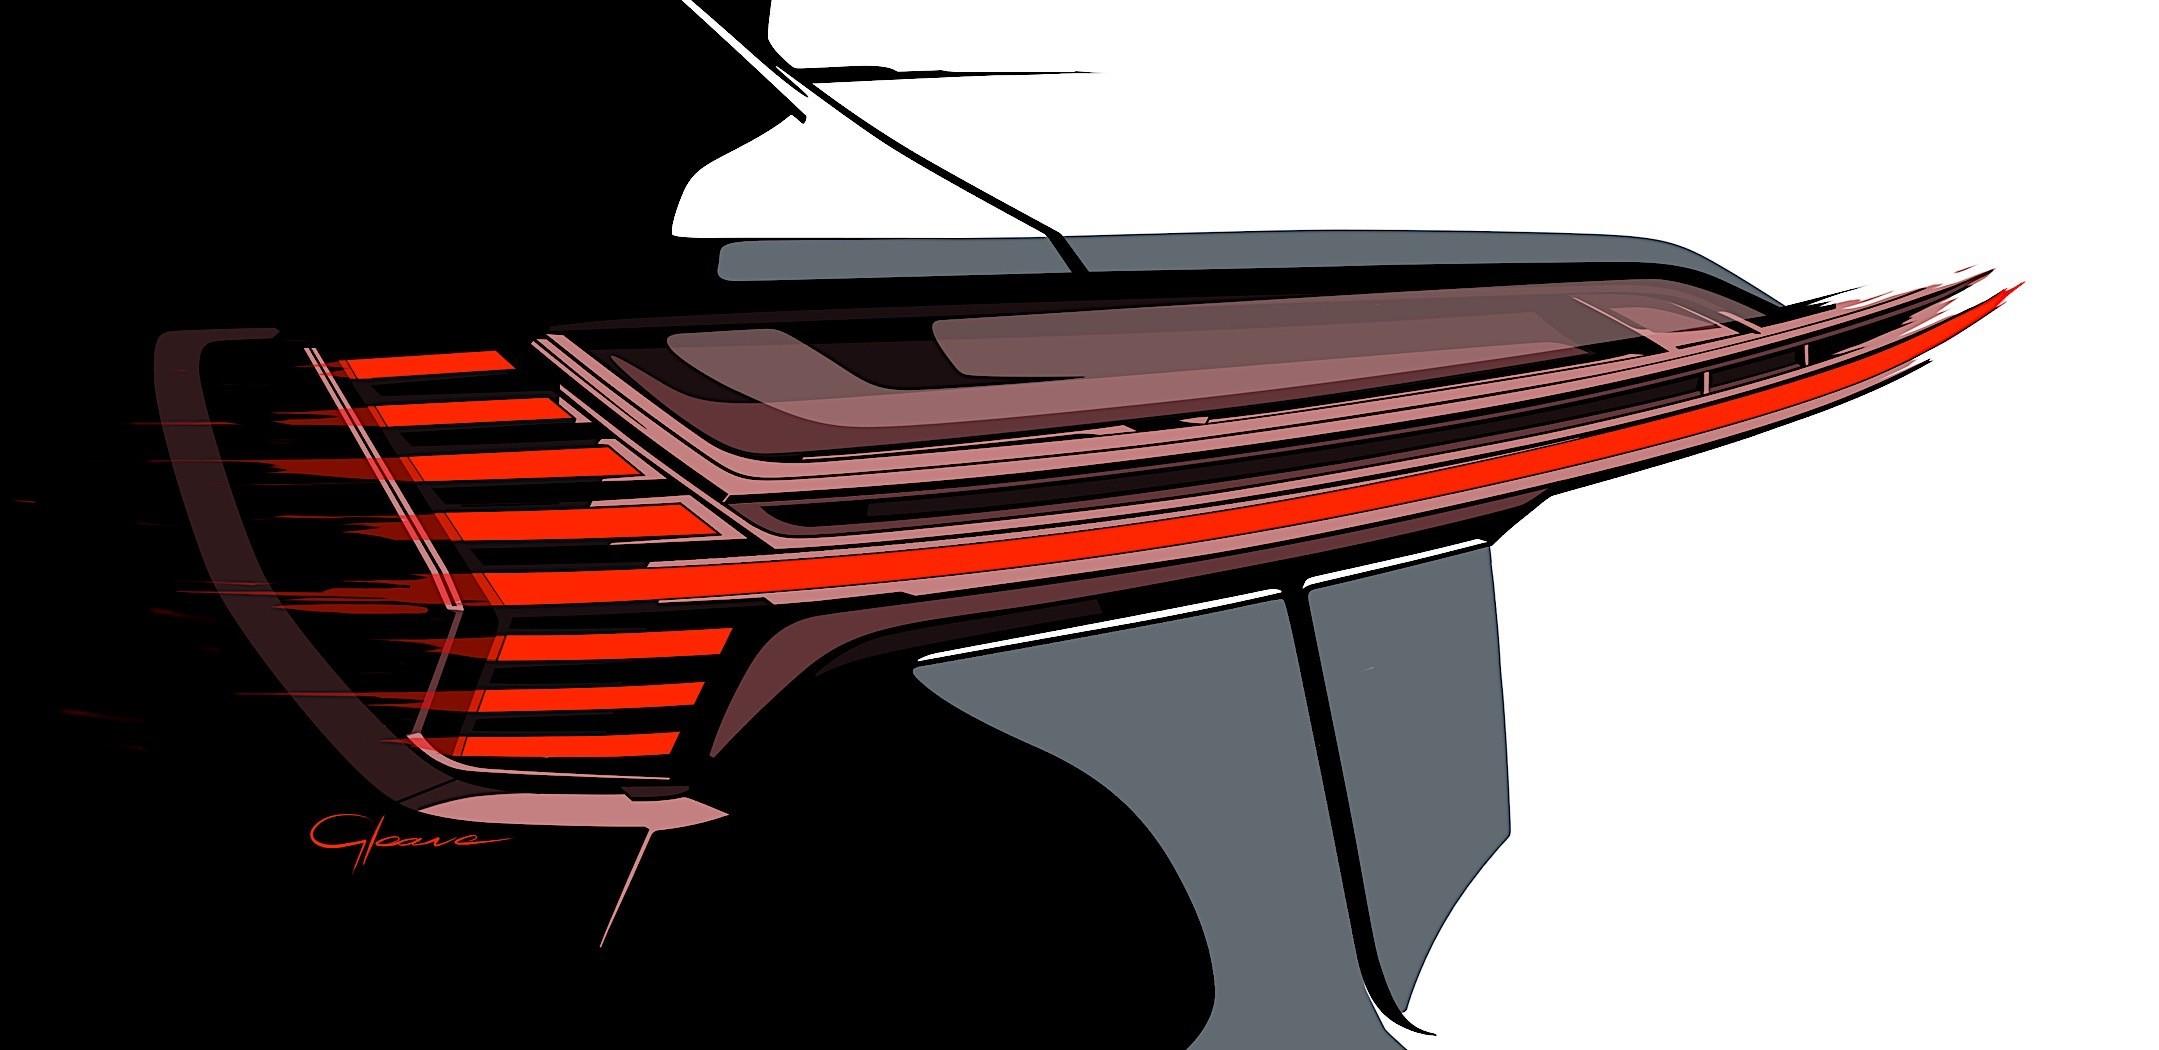 2019 Audi E Tron Priced At 74 800 In The United States Autoevolution